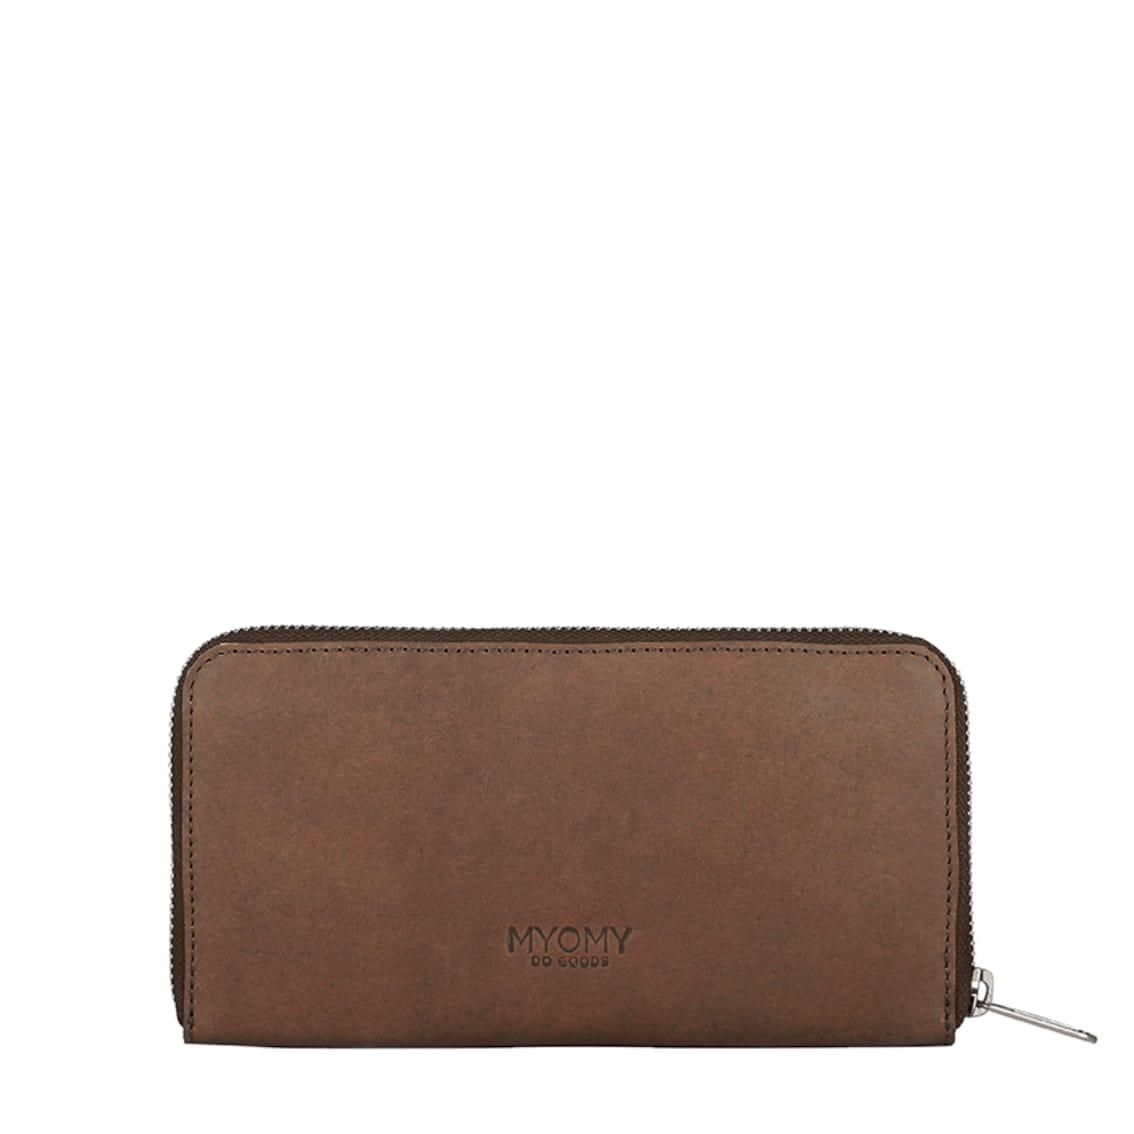 MY PAPER BAG Wallet Large (RFID) - hunter original